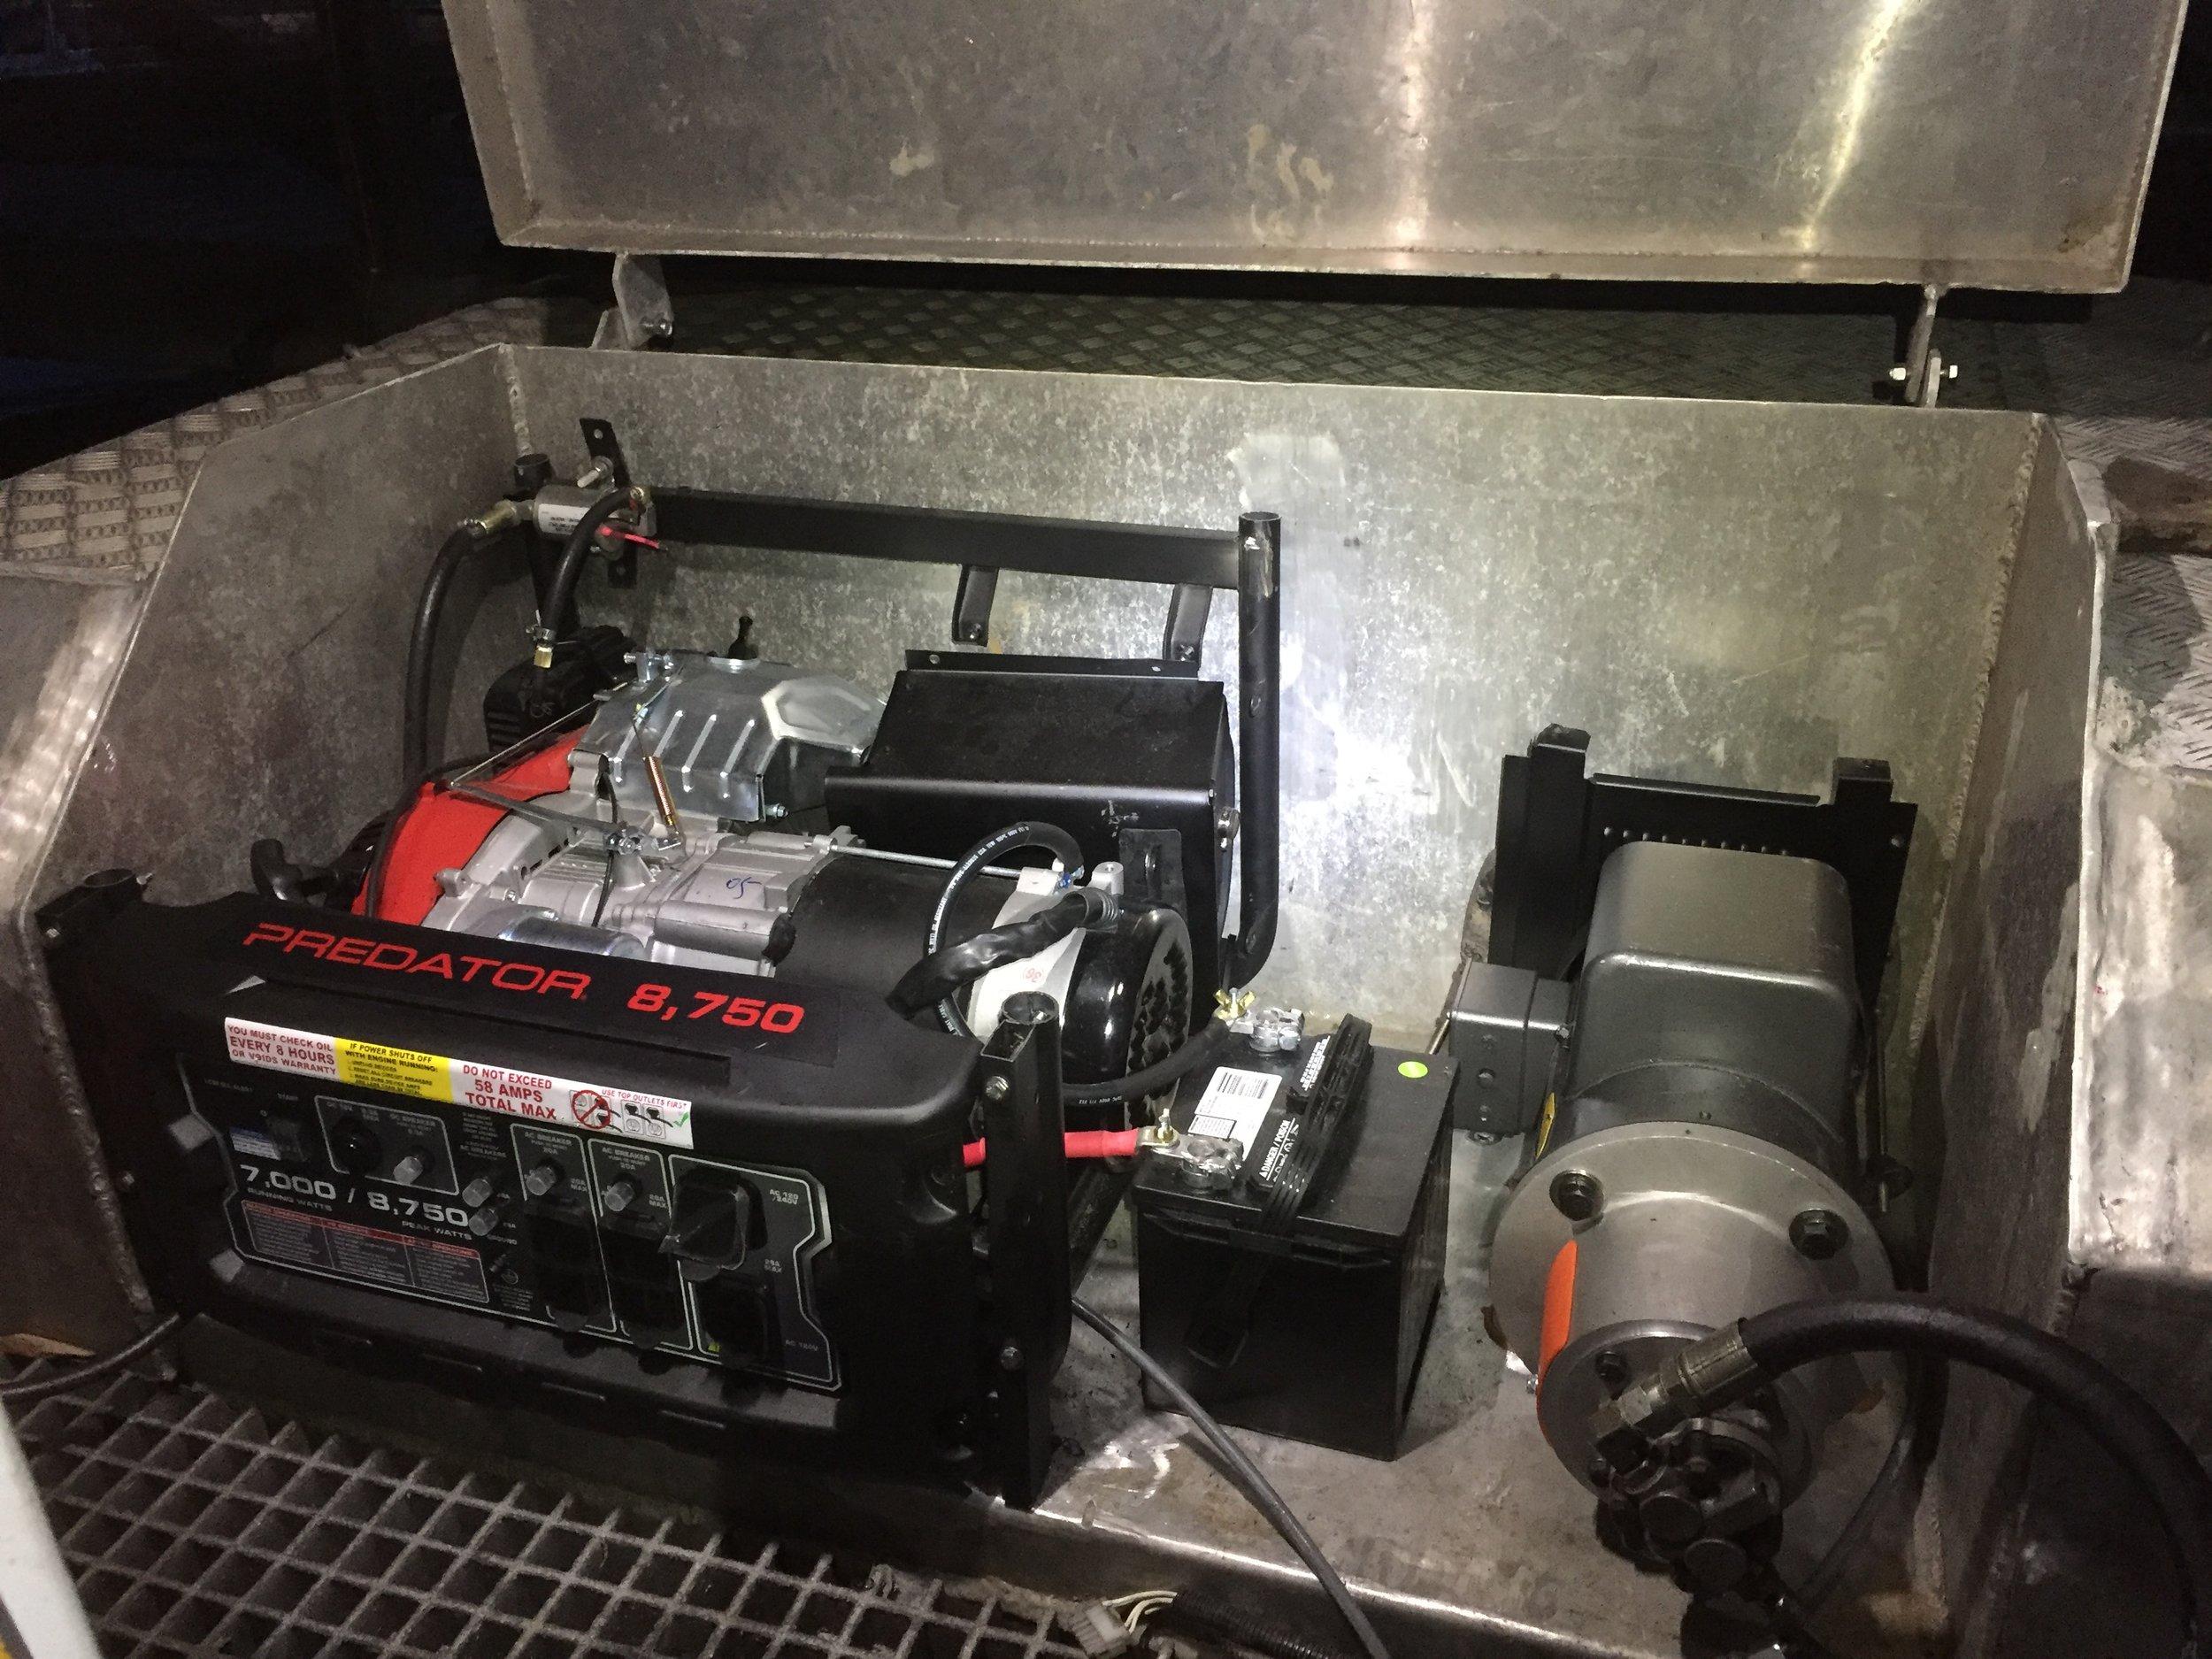 marine generator.JPG